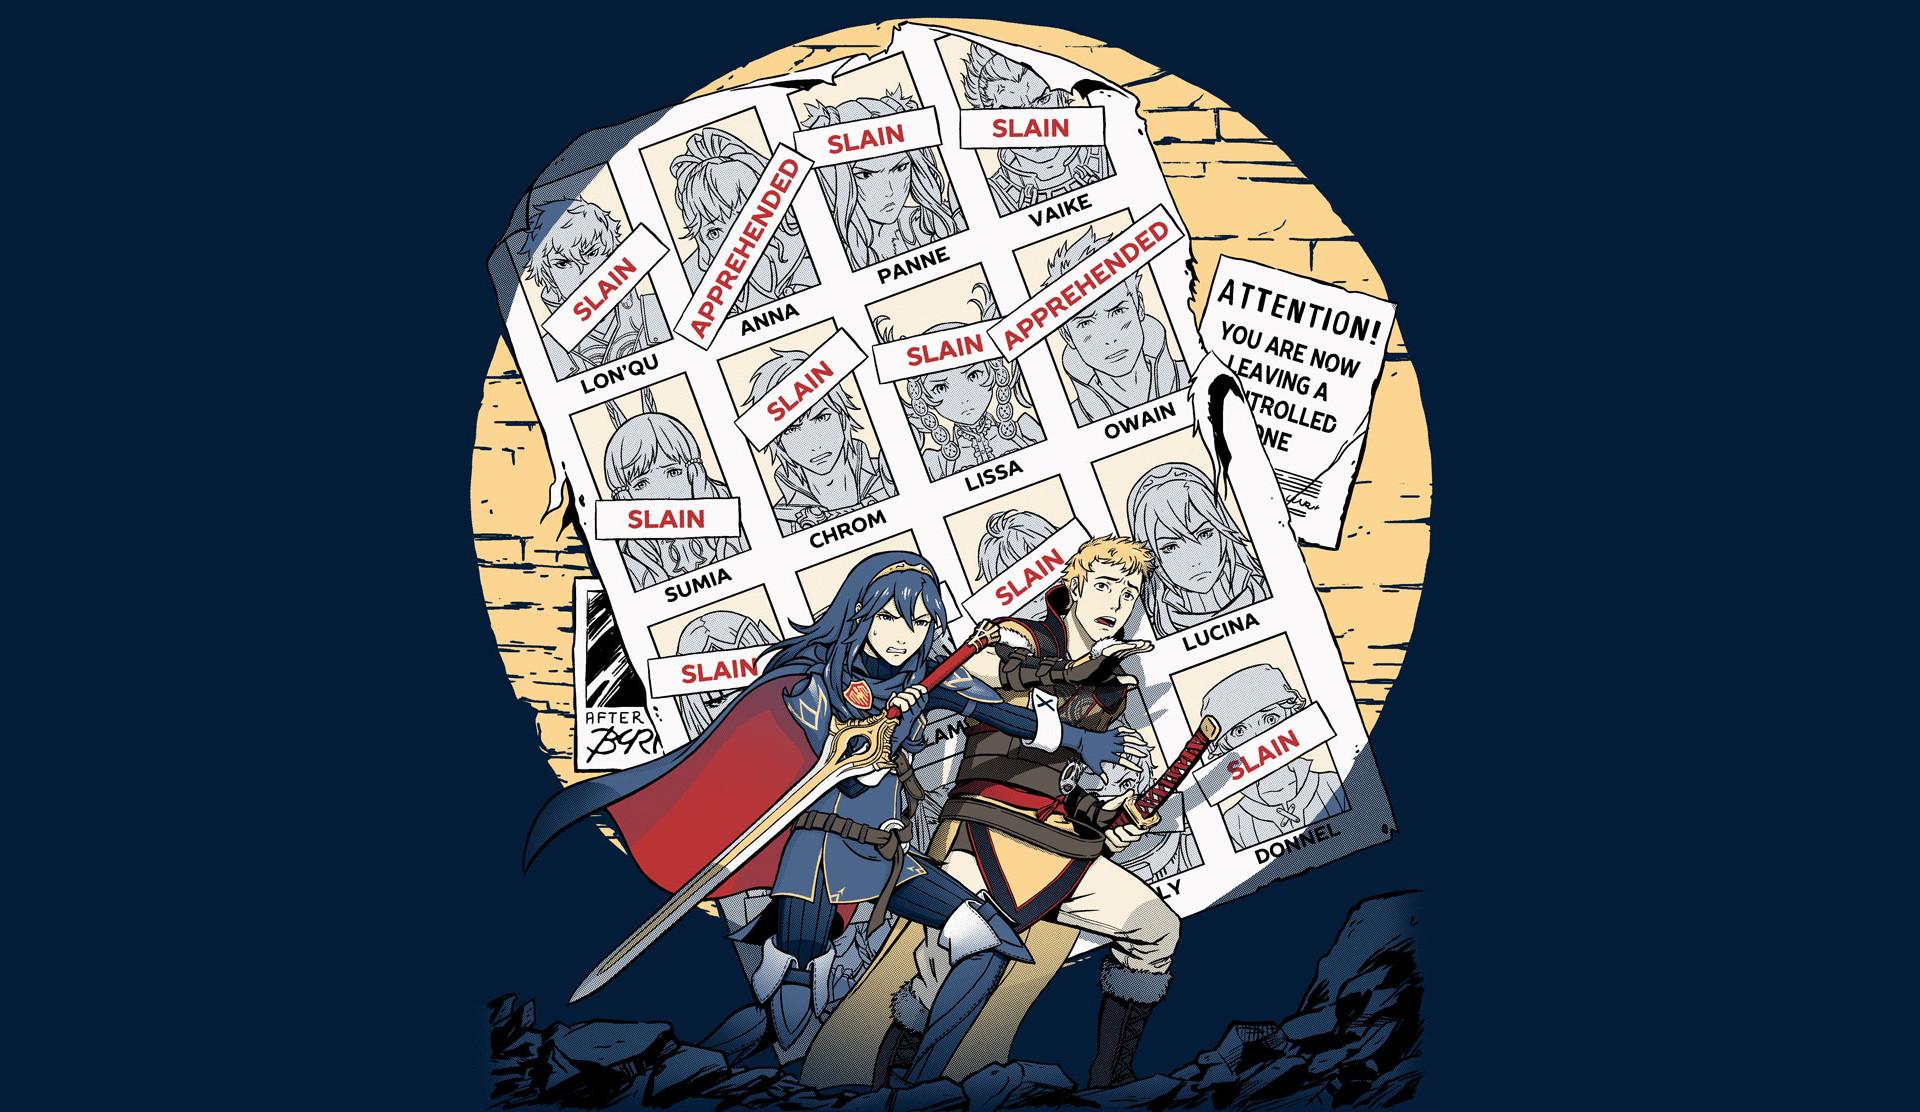 Fire Emblem Awakening & X-Men Crossover Wallpaper …